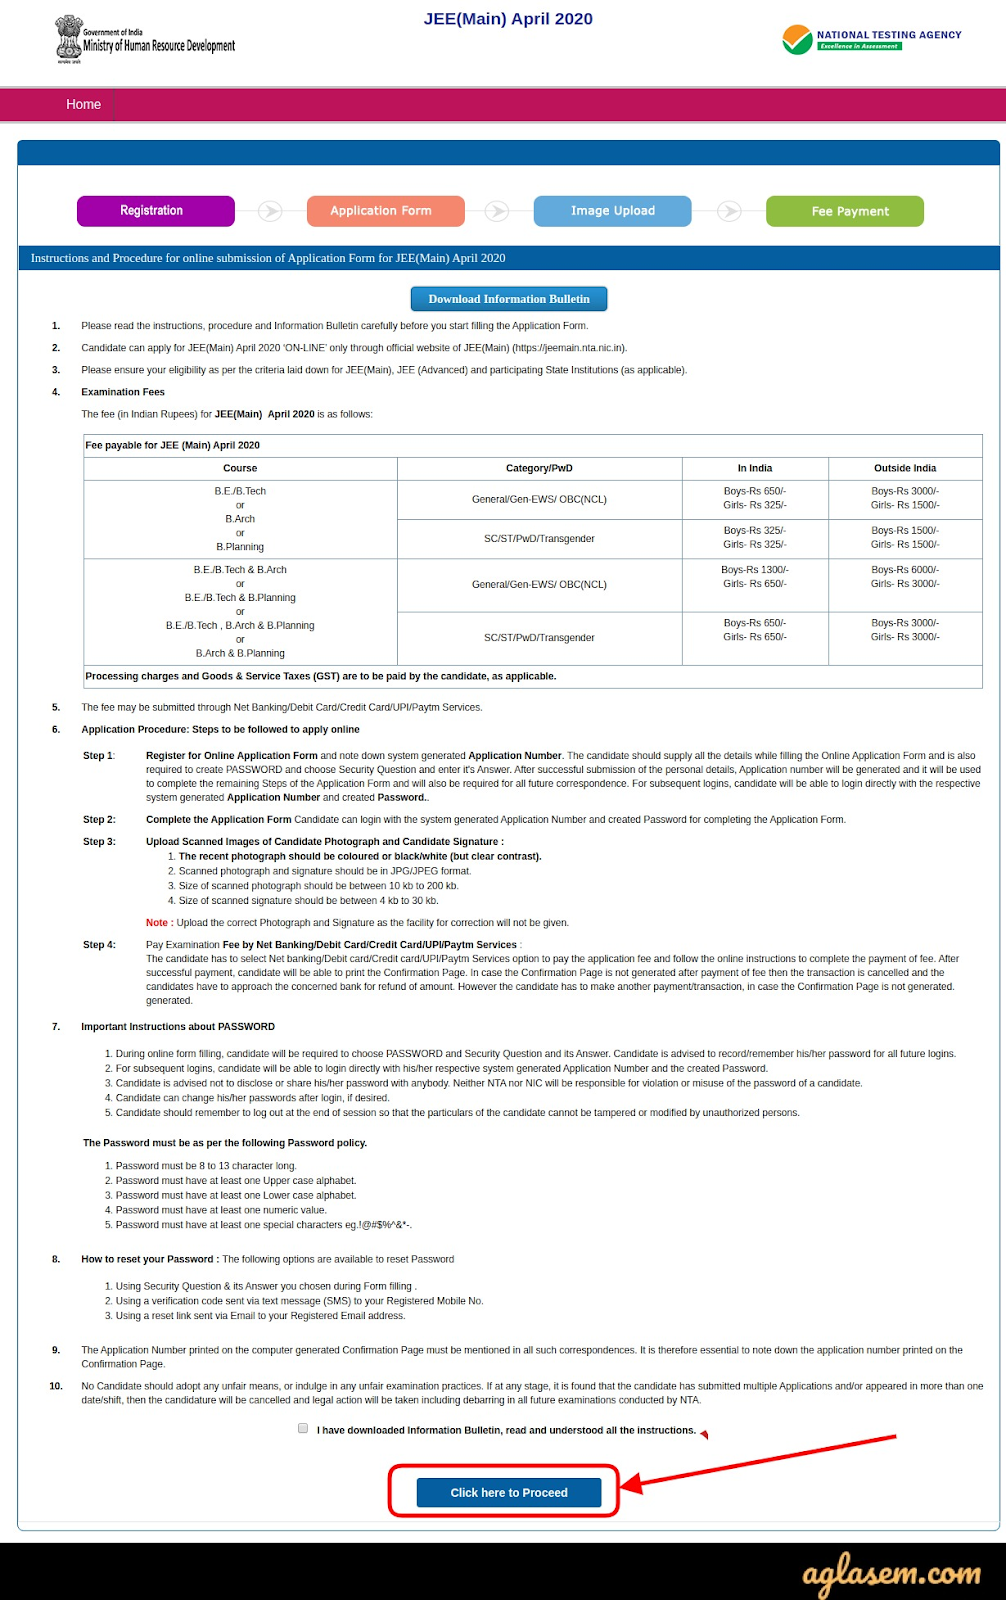 JEE Main April 2021 Instructions